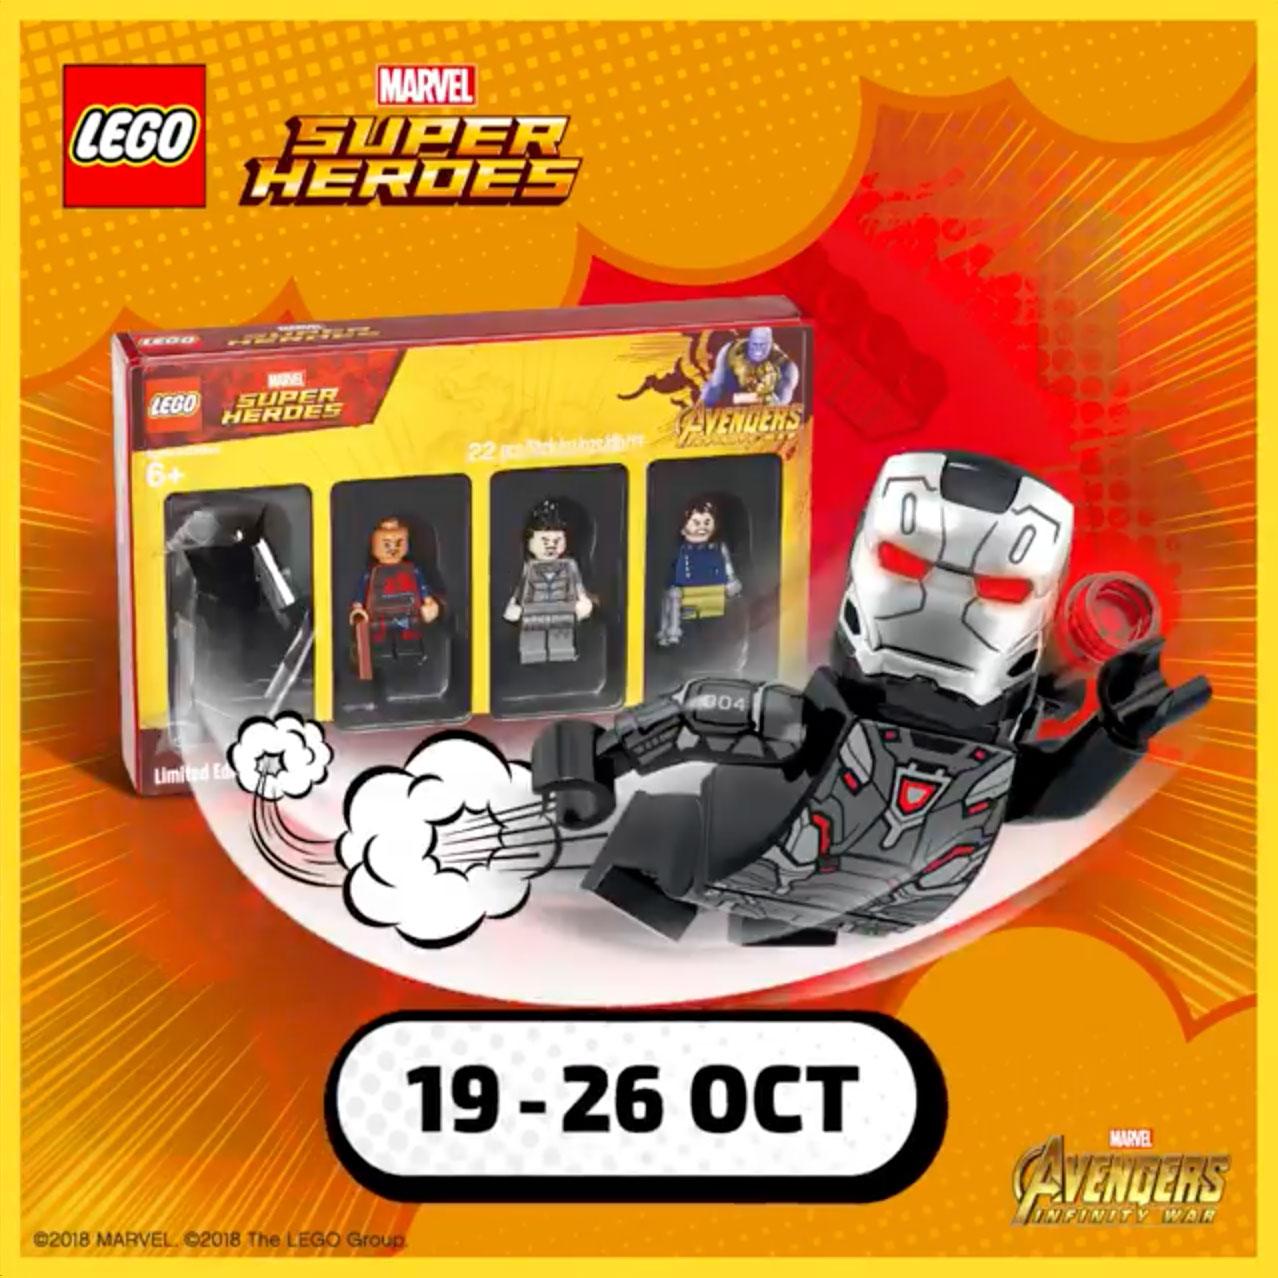 LEGO-bricktober-2018-marvel